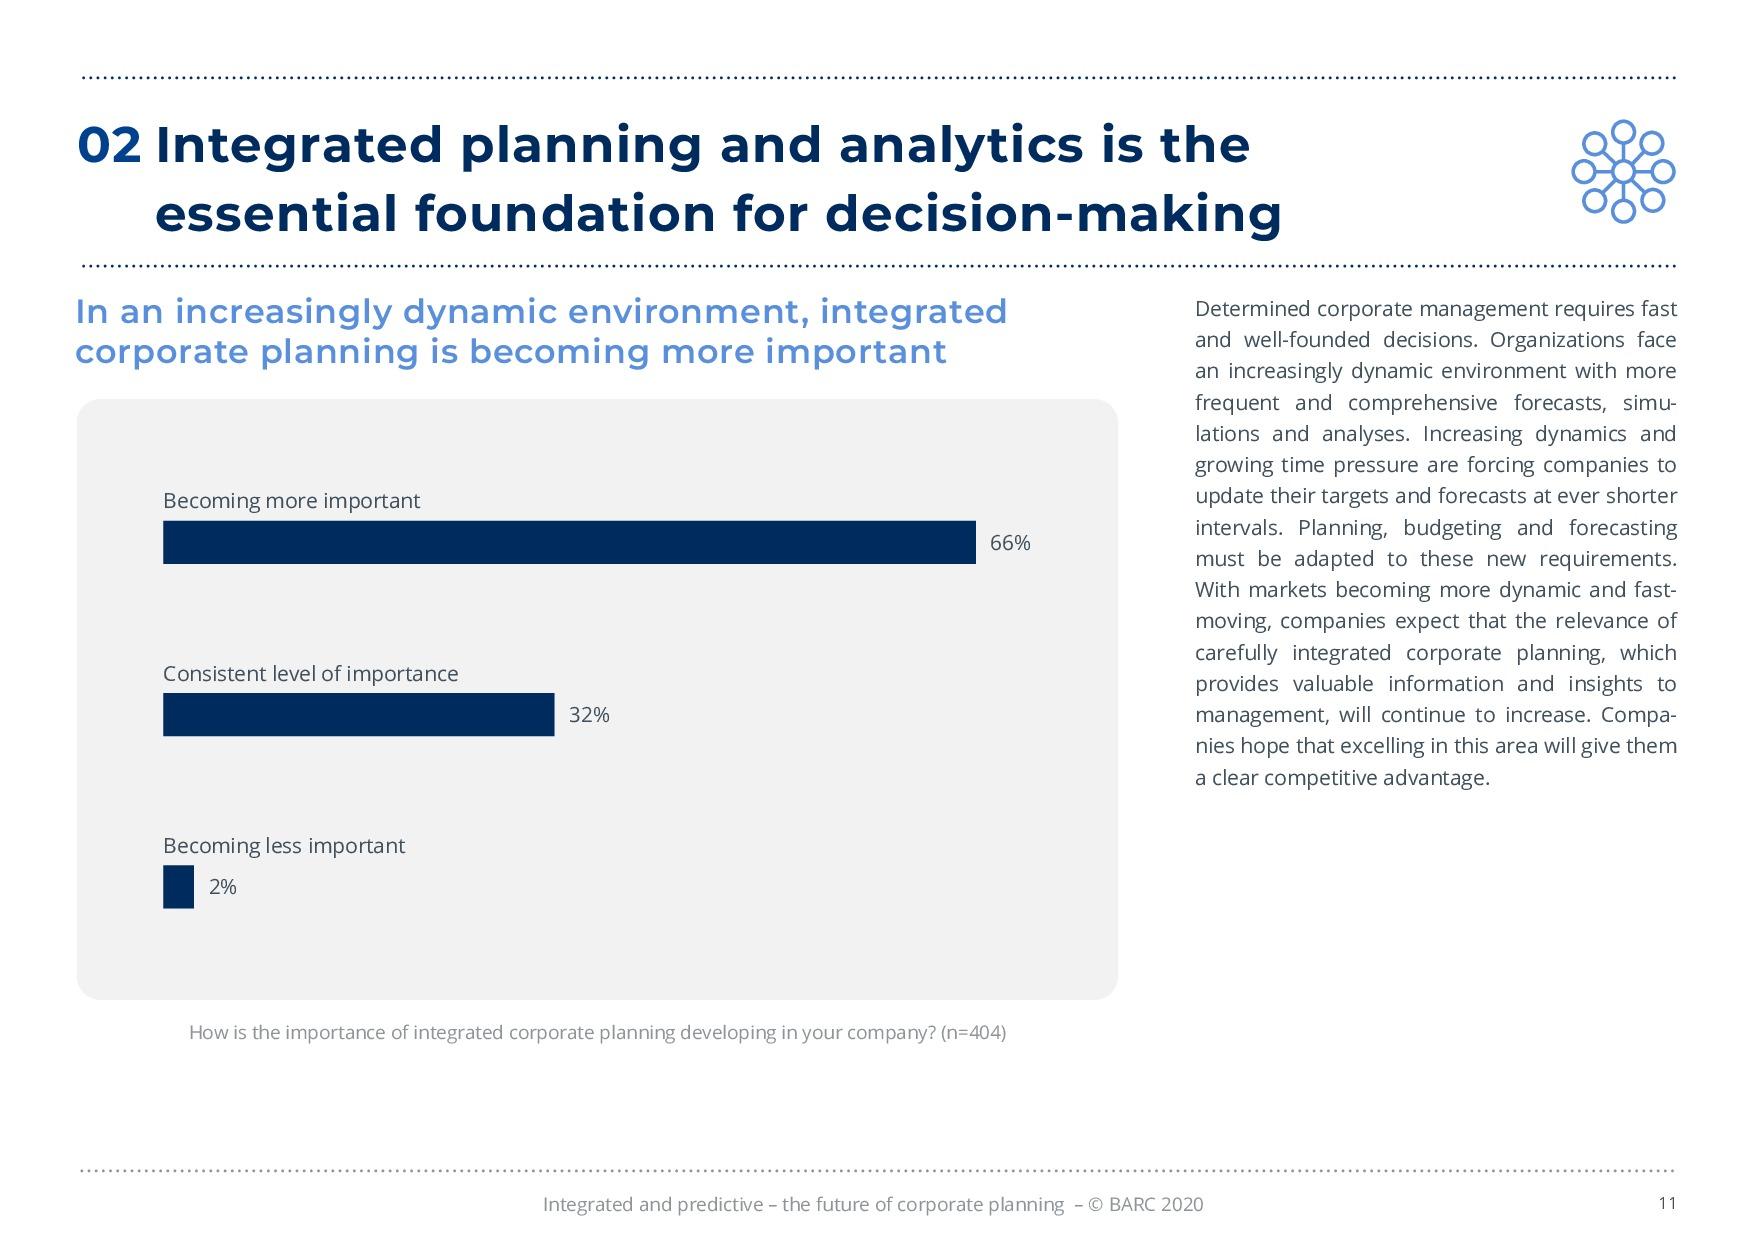 BARC – 統合と予測 – 経営計画の未来 | Page 11